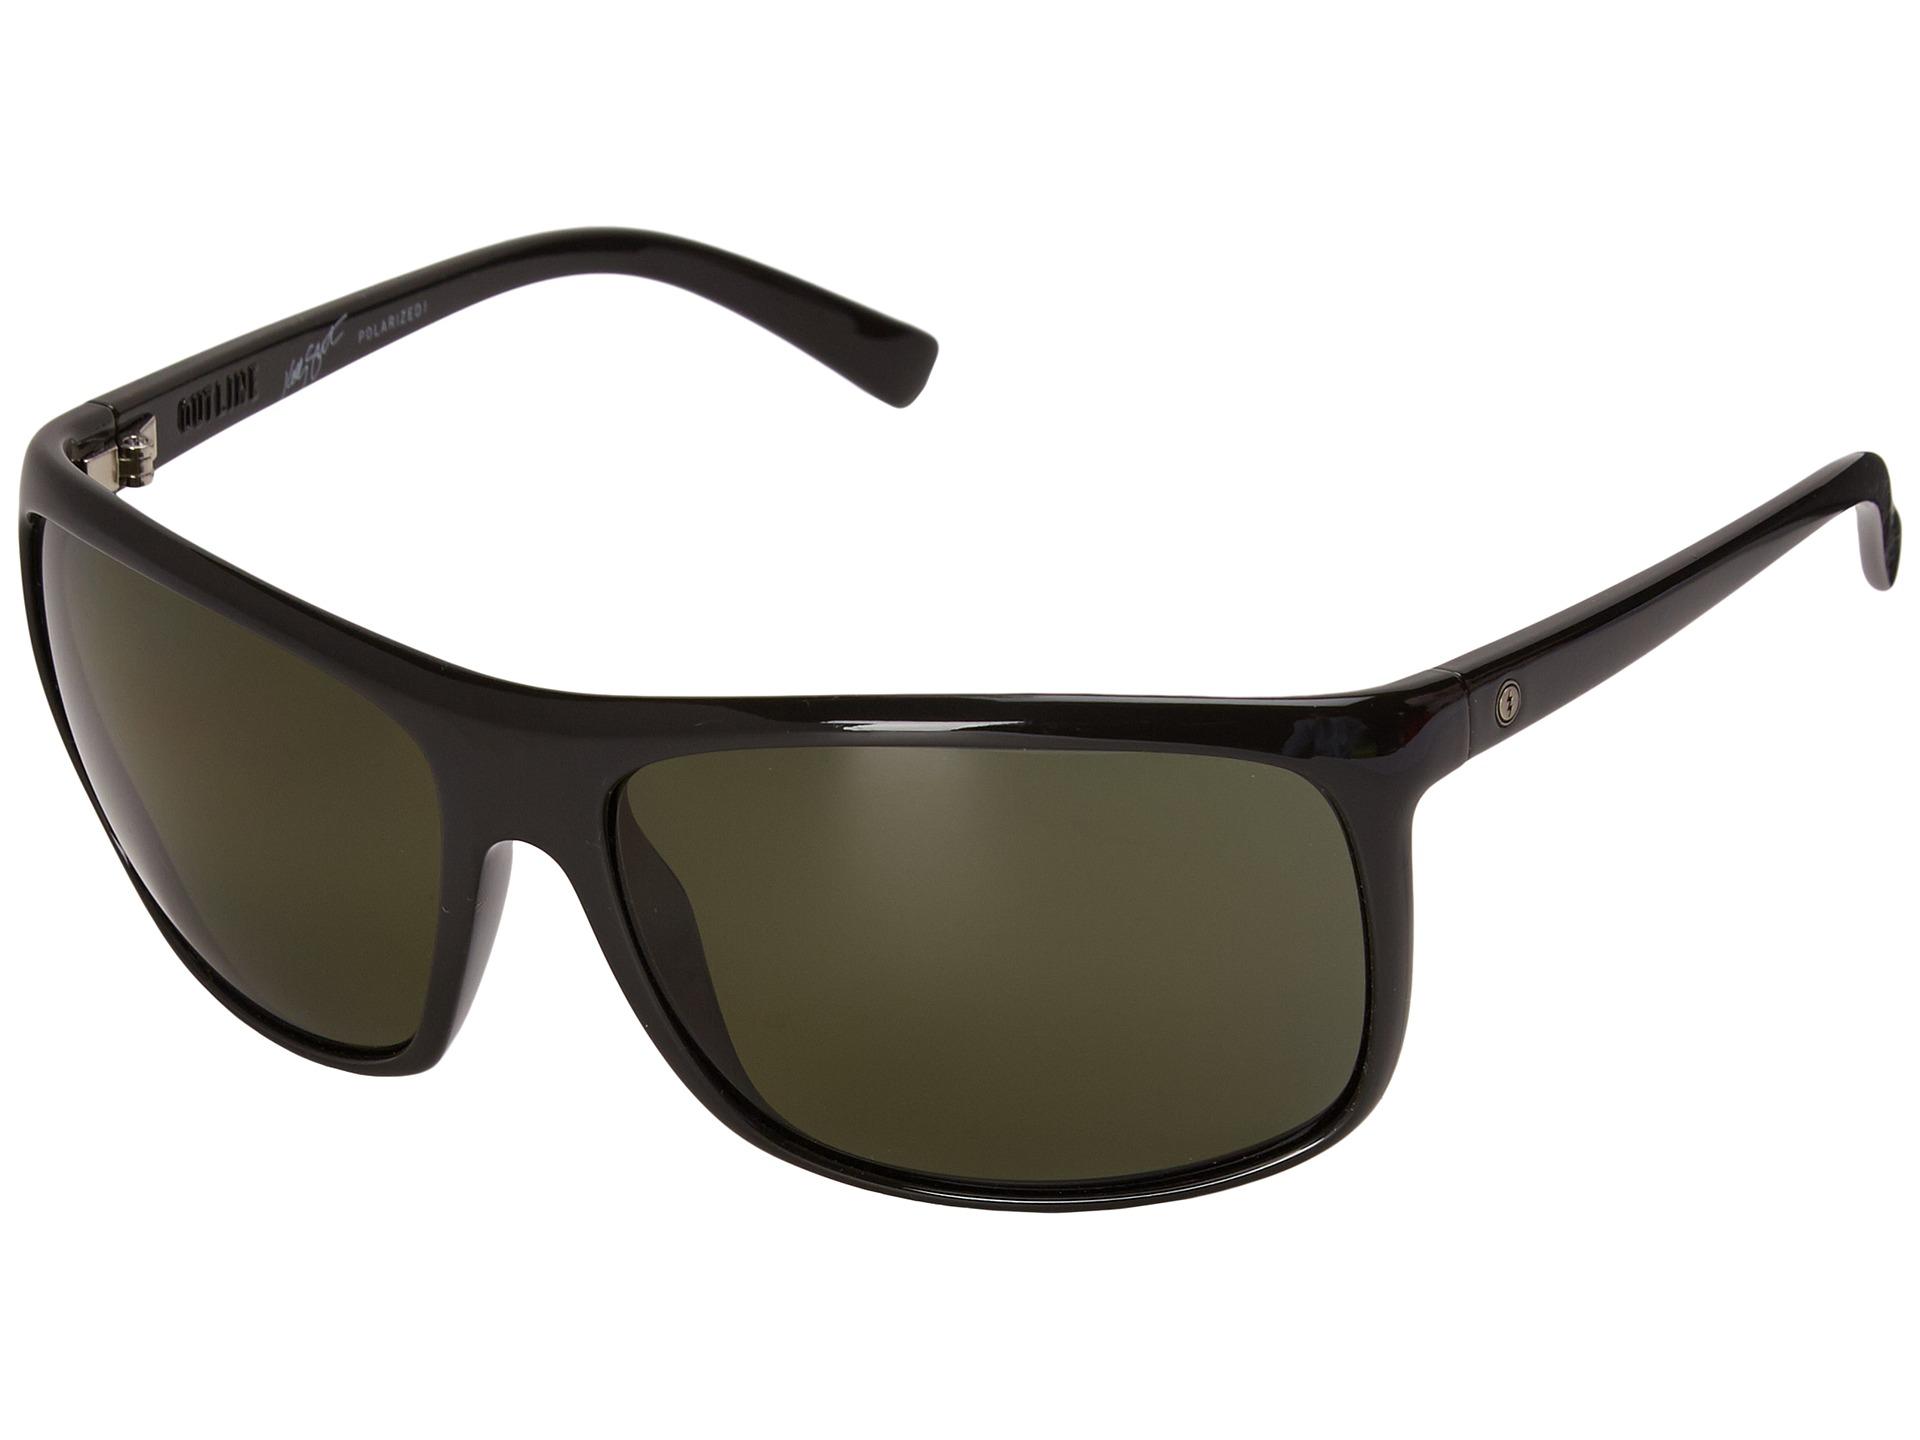 electric eyewear outline zappos free shipping both ways